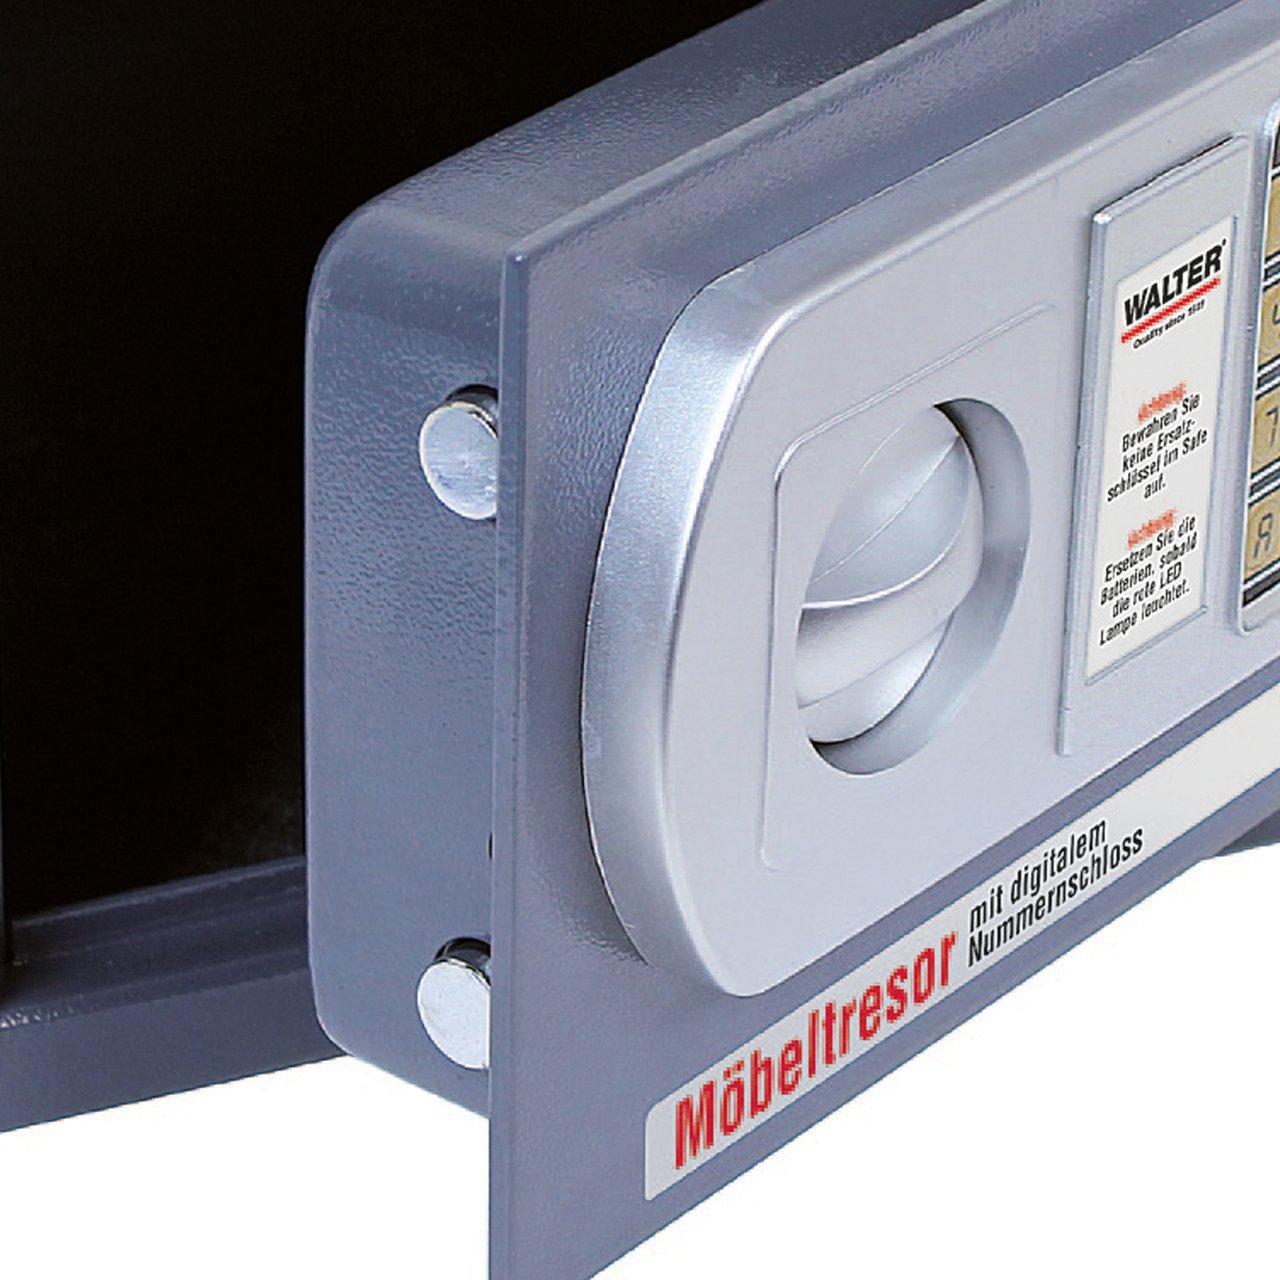 Wandtresor mit digitalem Nummernschloss Möbeltresor WALTER Elektronischer Safe